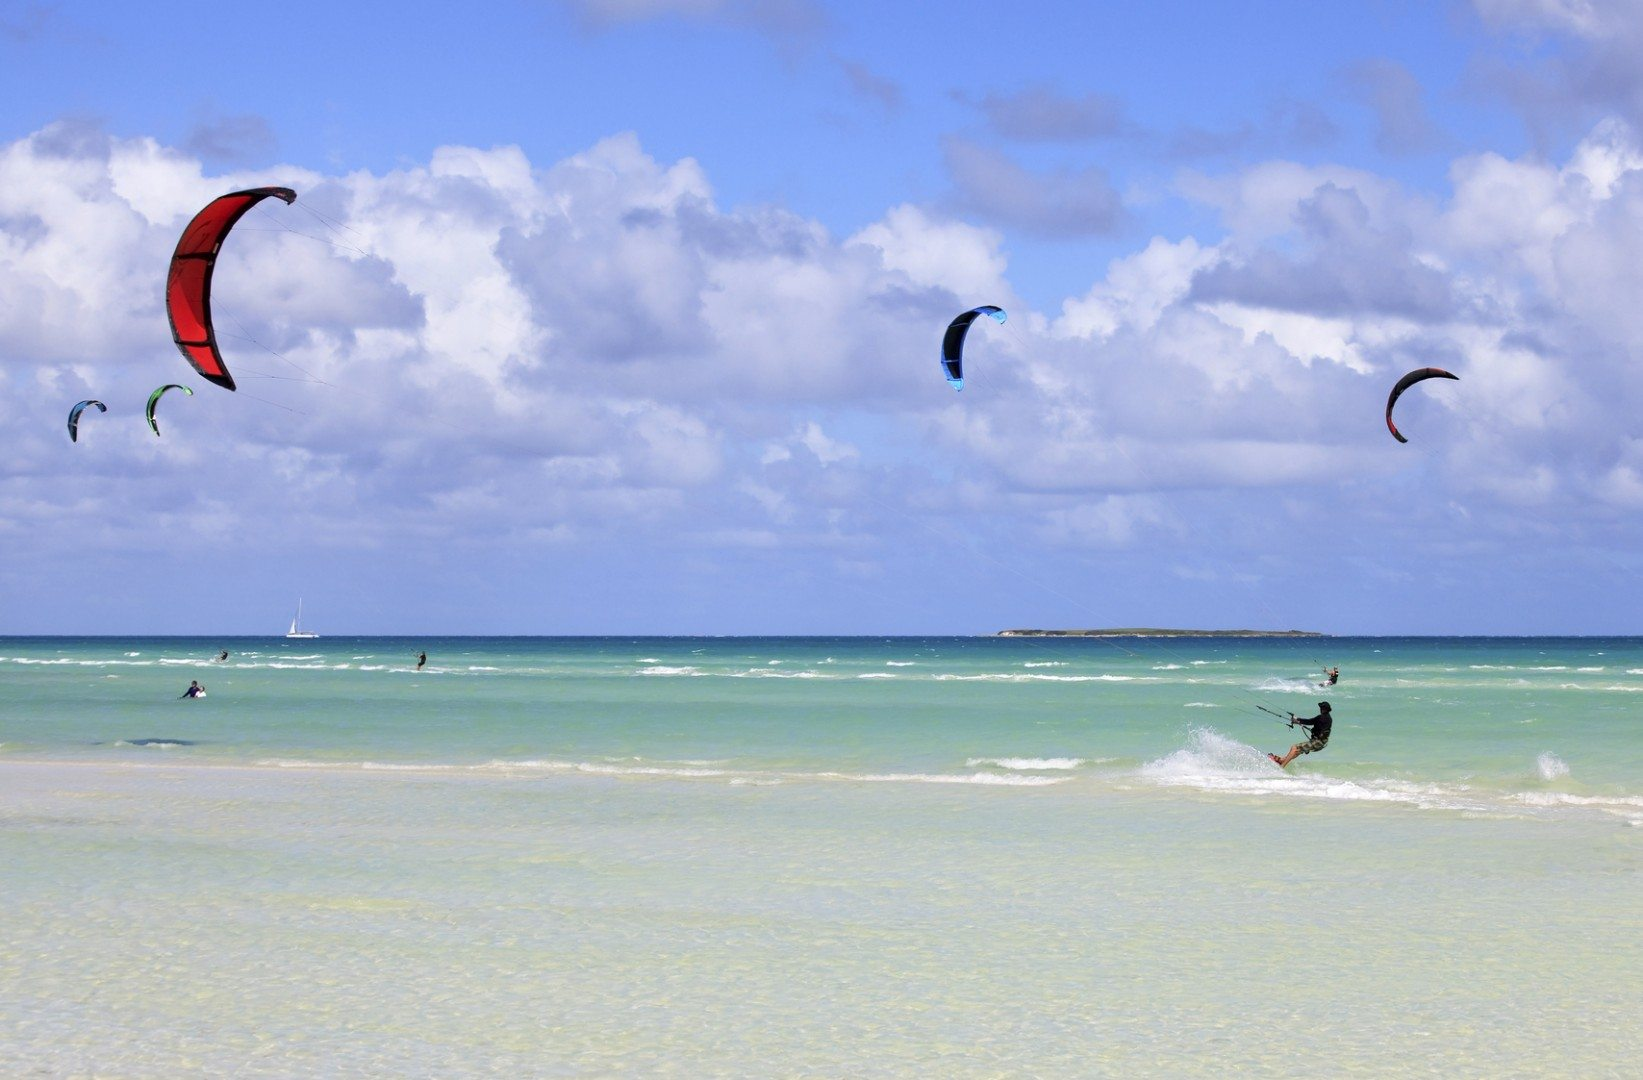 Kitesurfing Caribbean